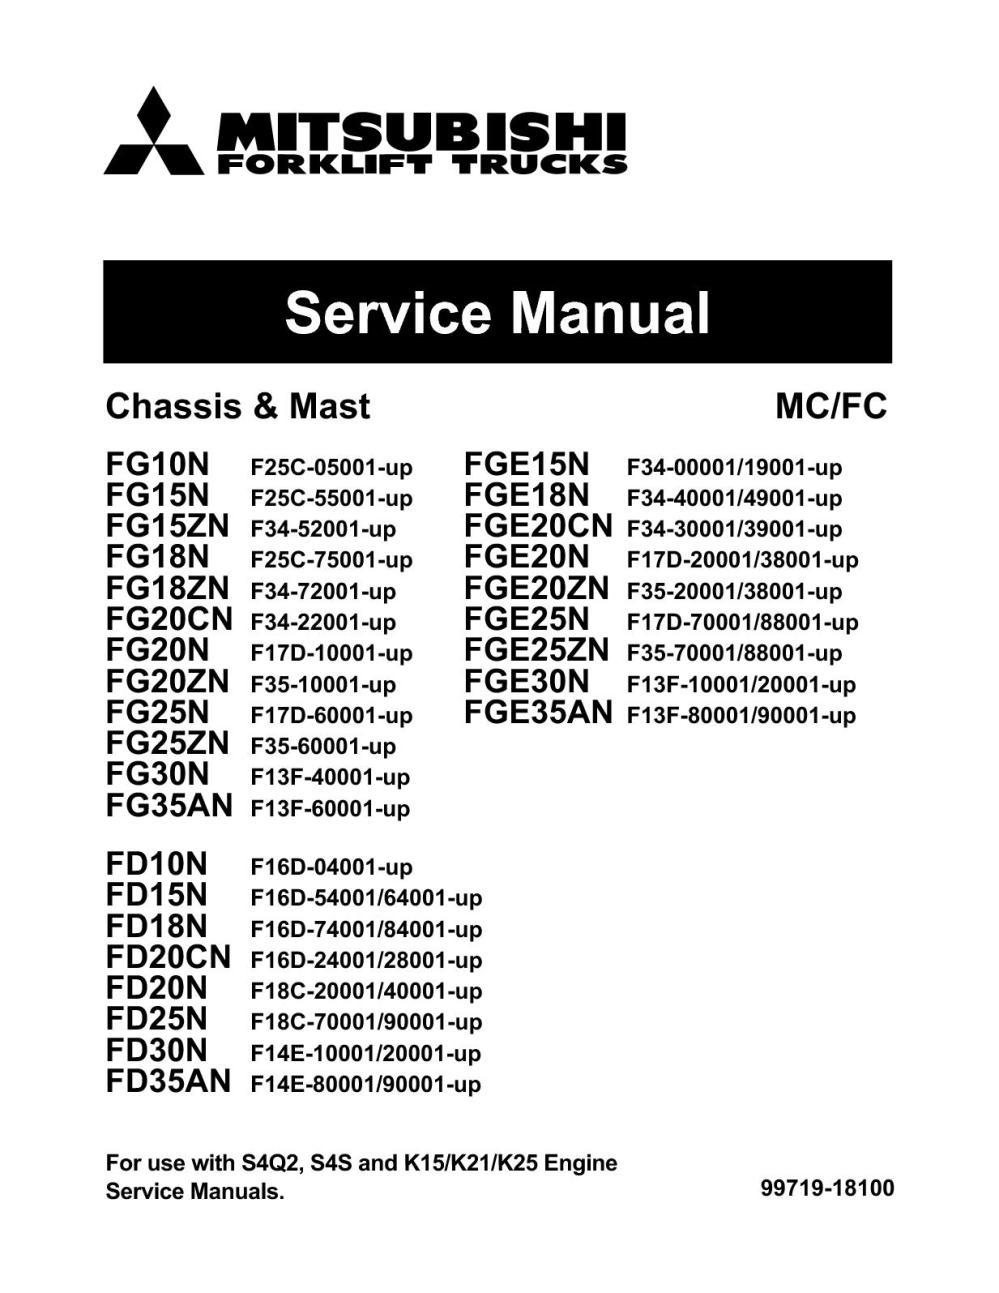 medium resolution of mitsubishi fg18zn forklift trucks service repair manual sn f34 70001 up